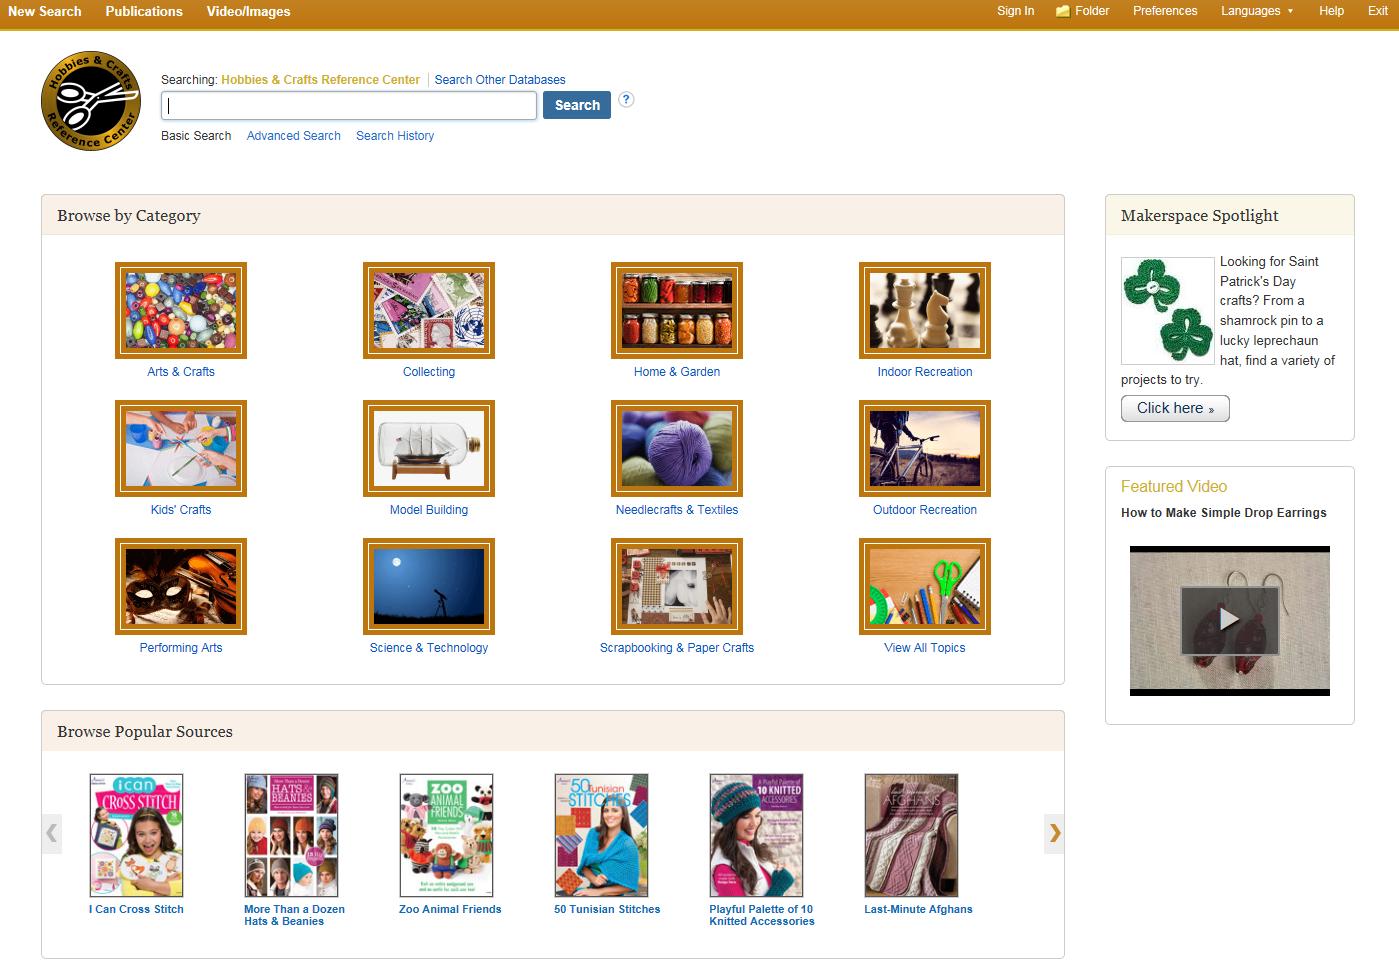 Hobbies & Crafts Reference Center | EBSCO